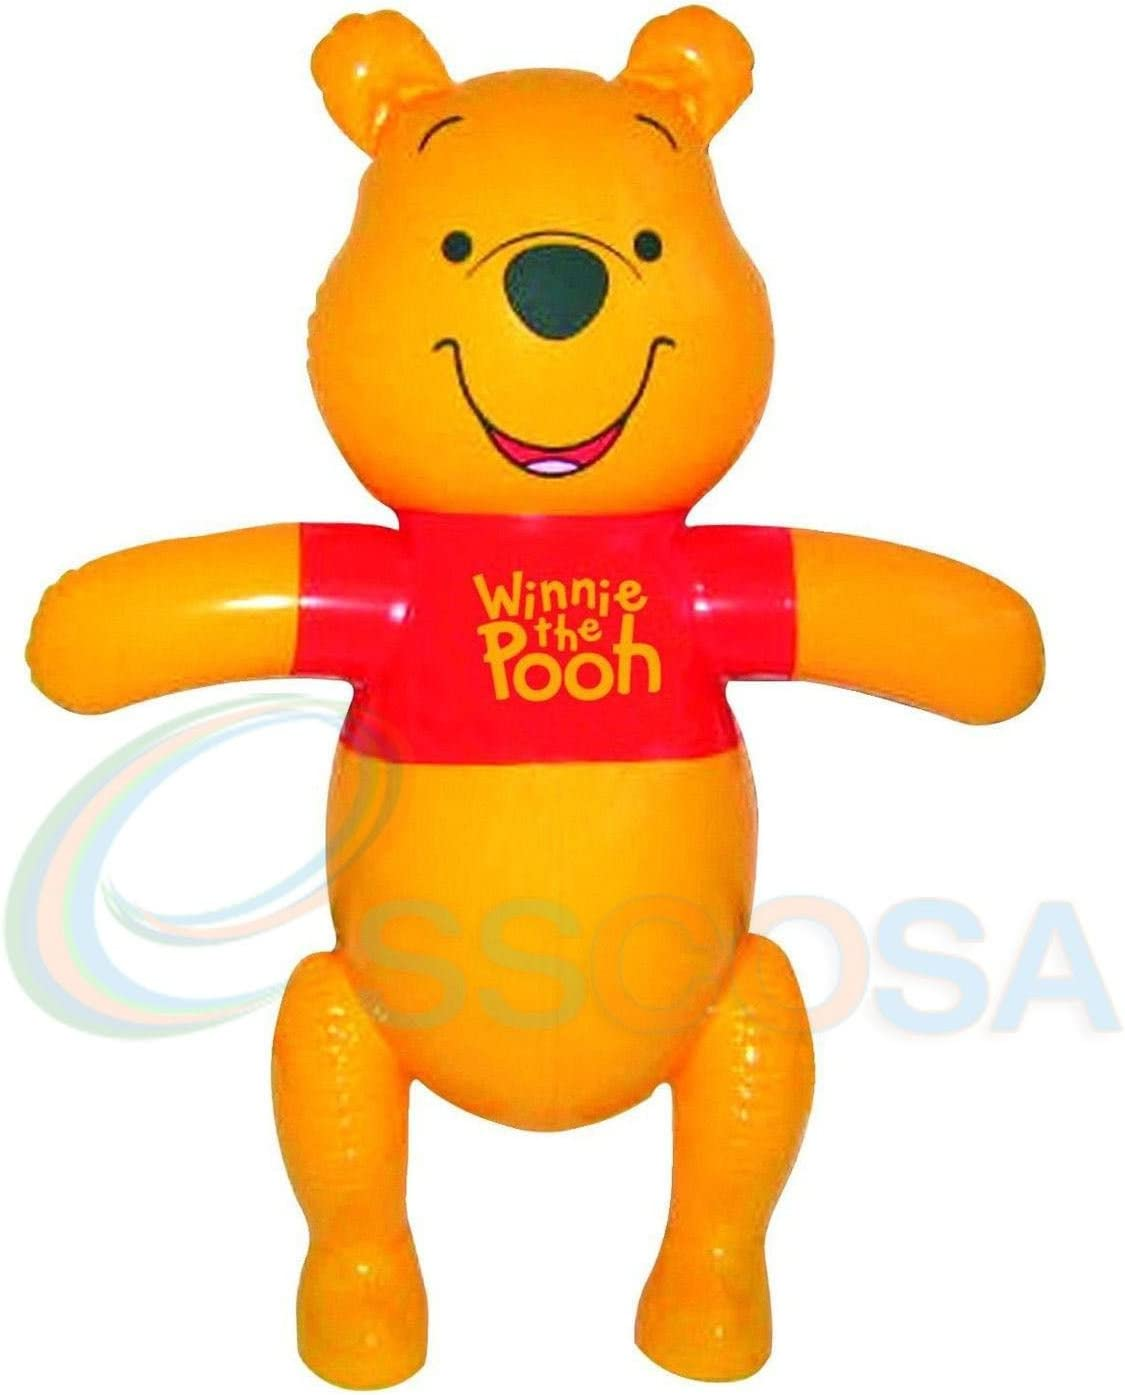 Disney Nuevo Inflable Winnie The Pooh, Personaje Oficial, Juguete ...